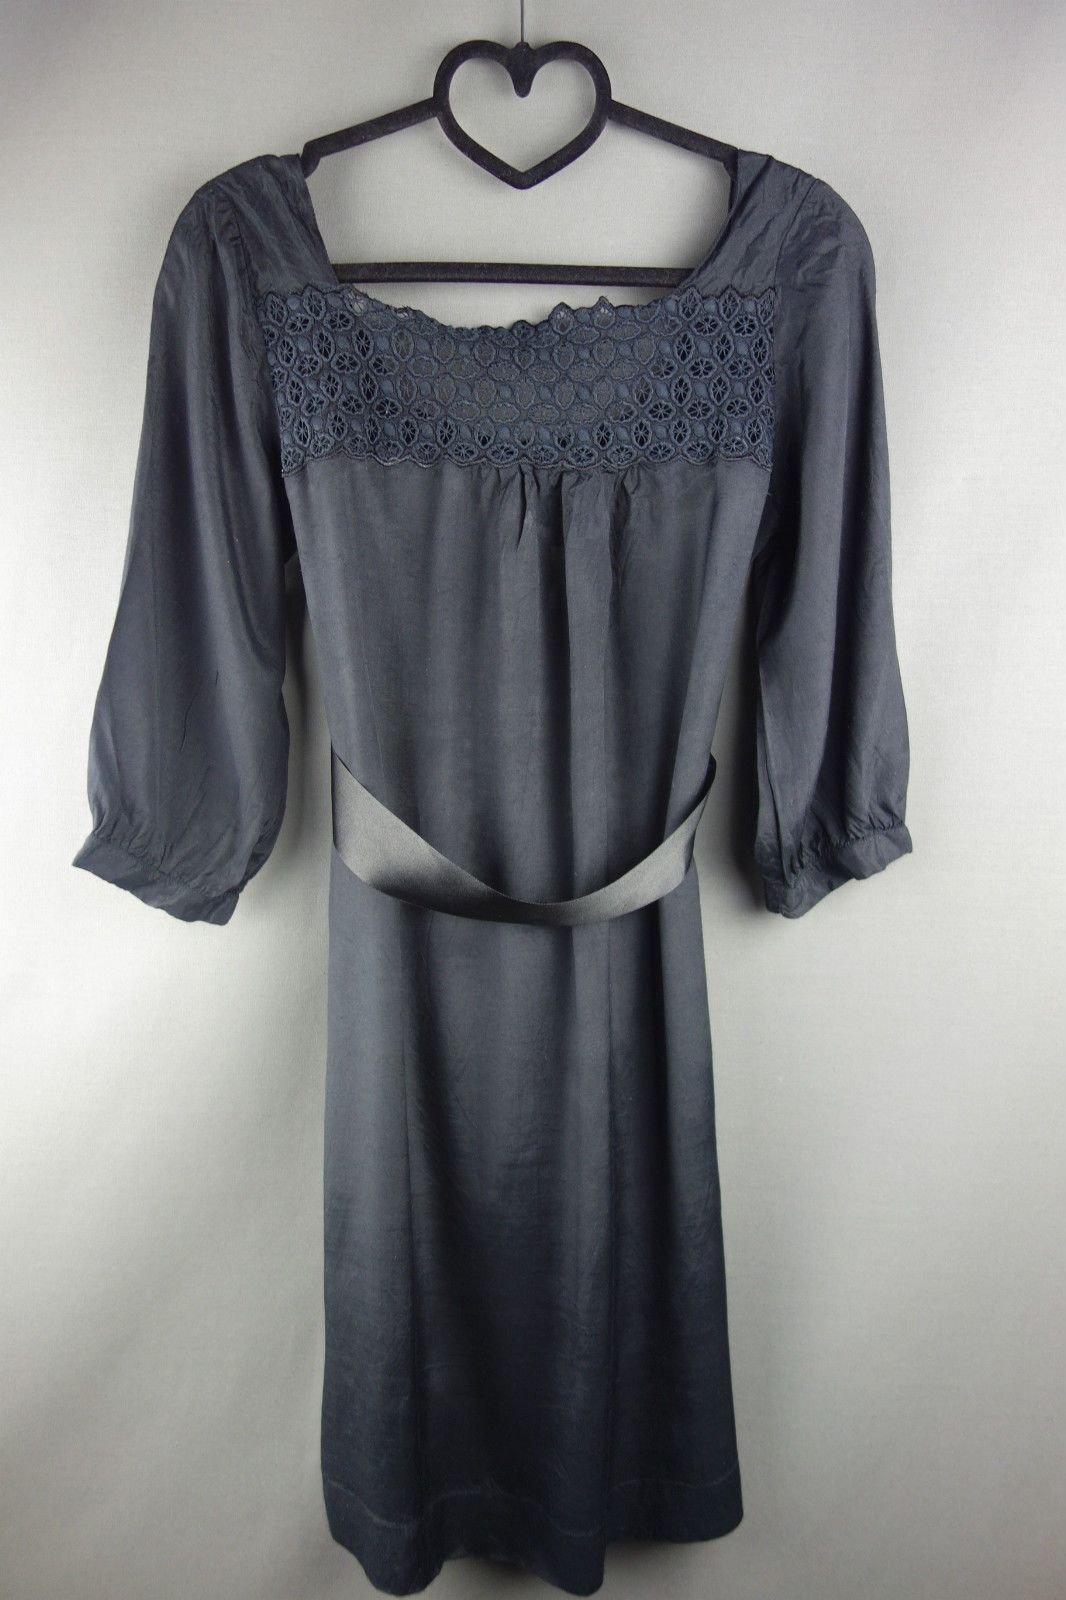 Ebay cocktail dress size 8 47